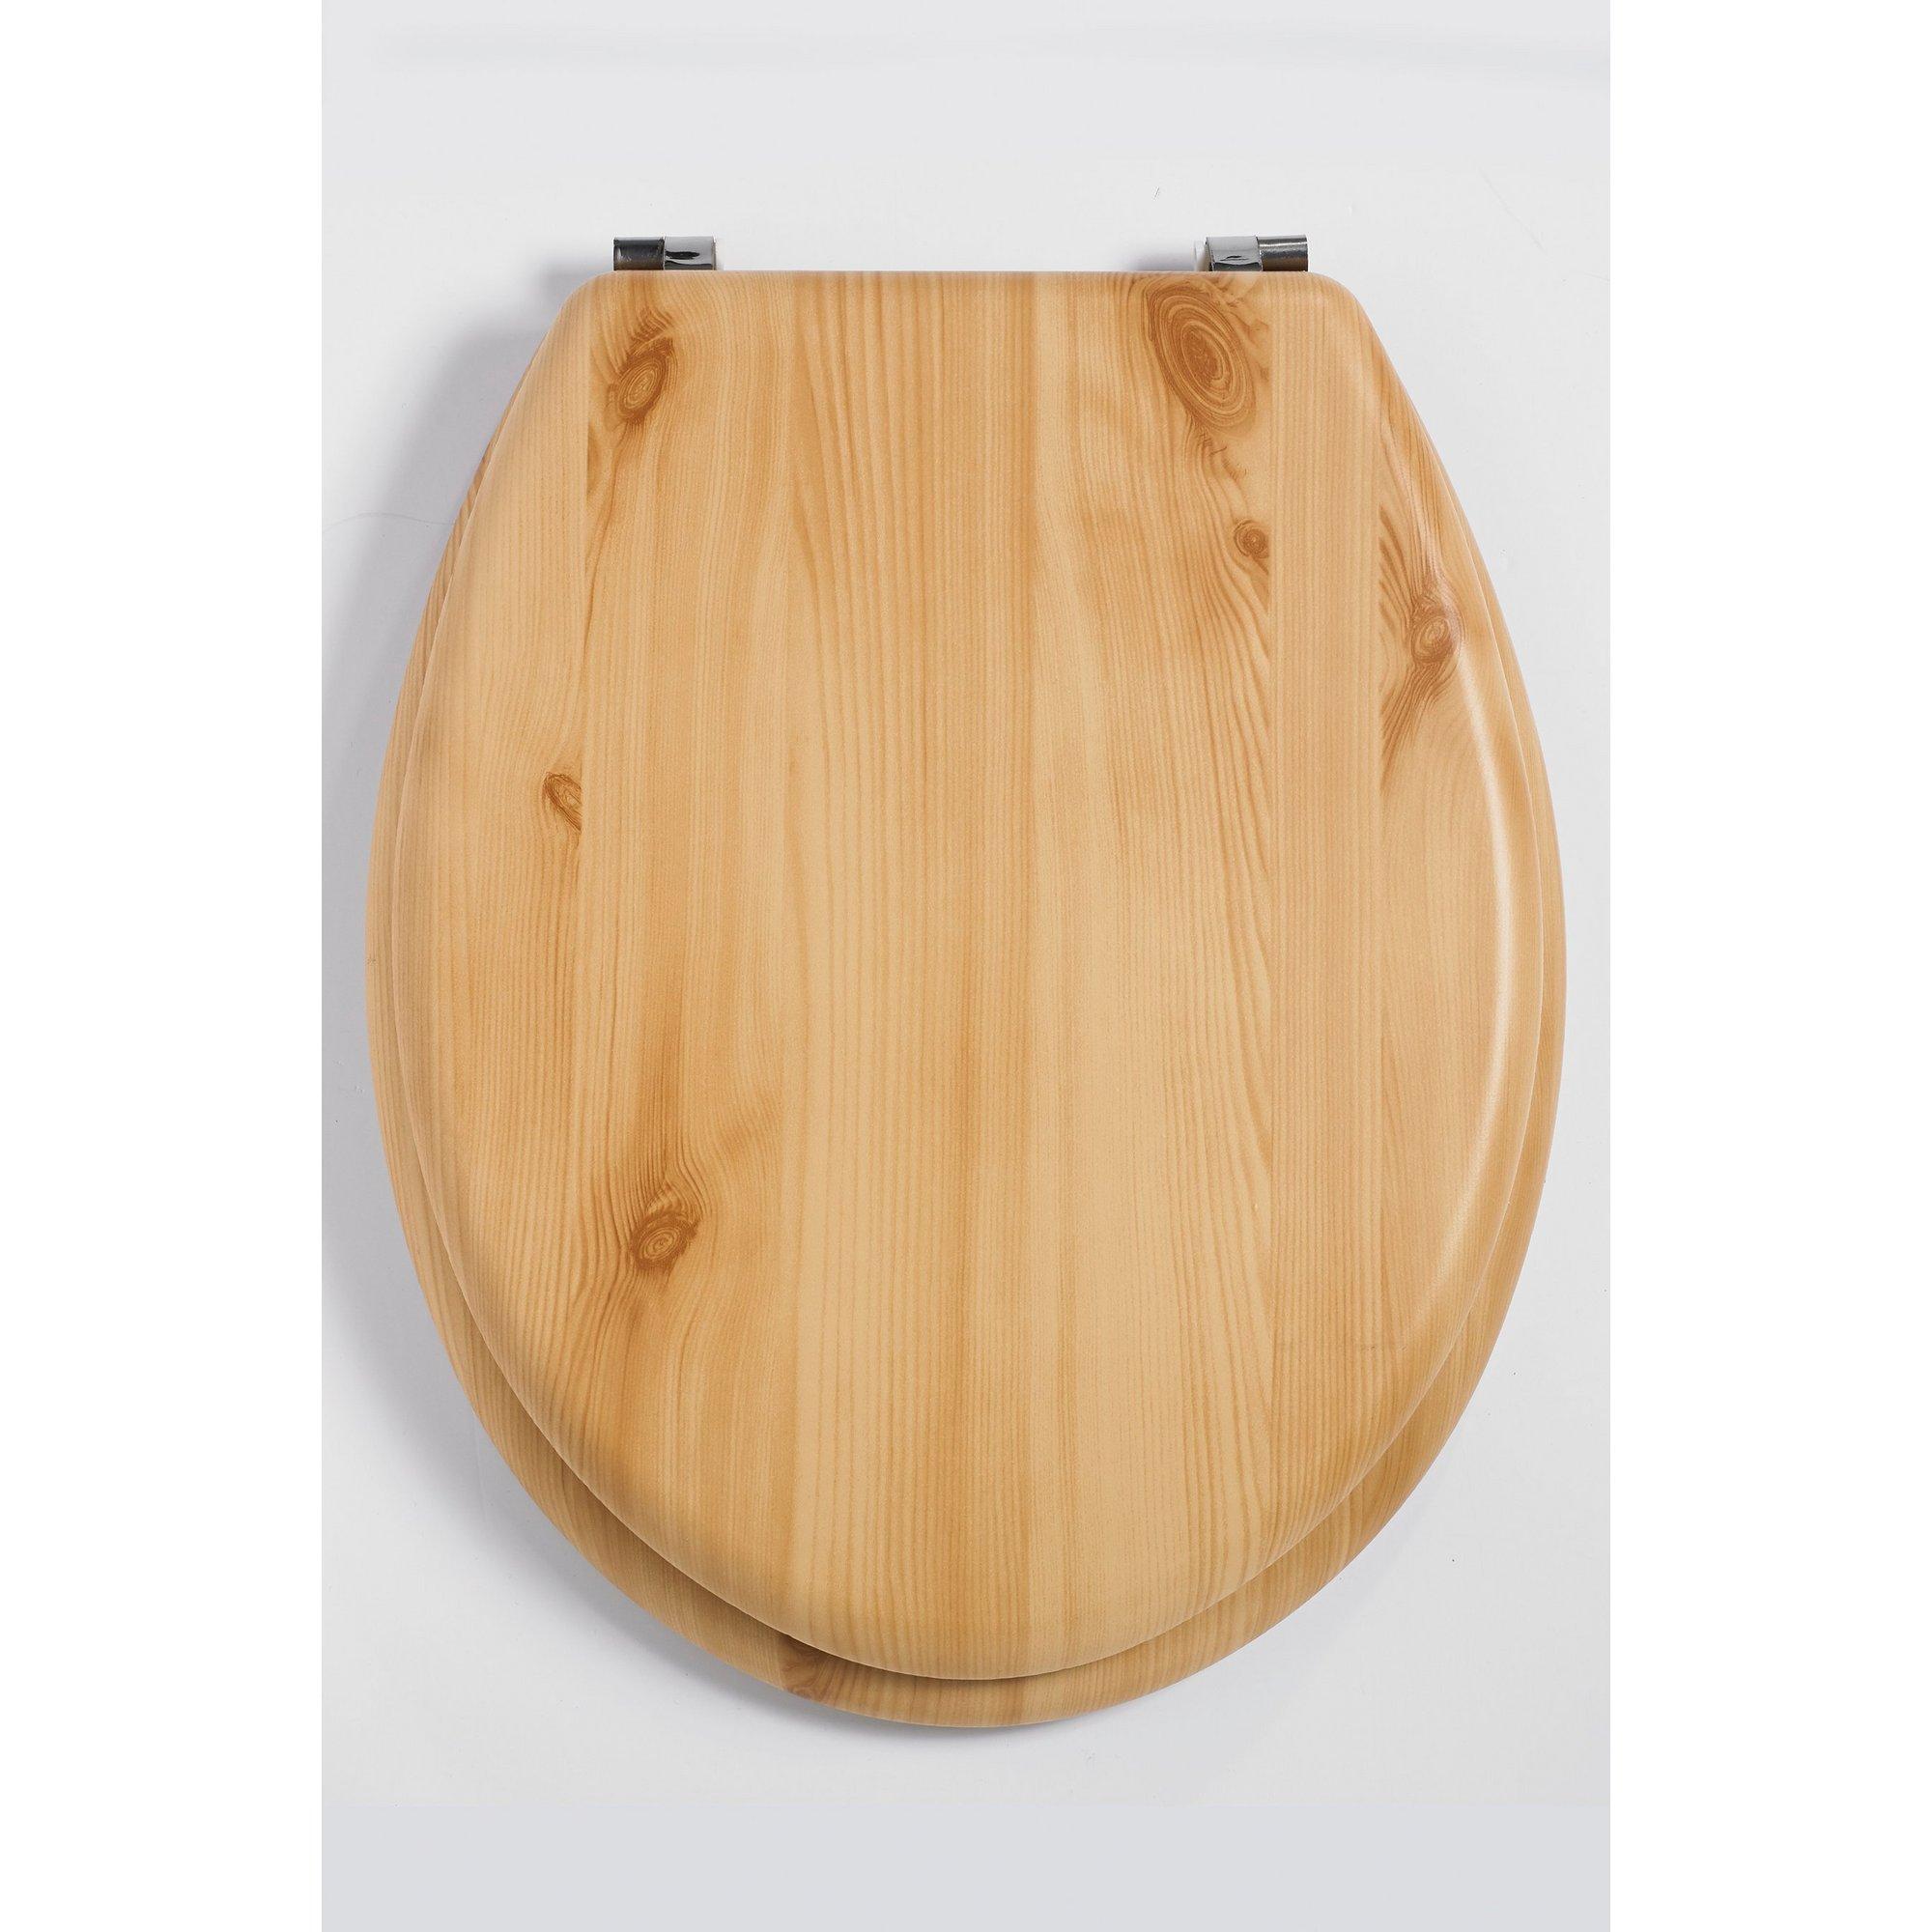 Image of Beldray Wooden Toilet Seat